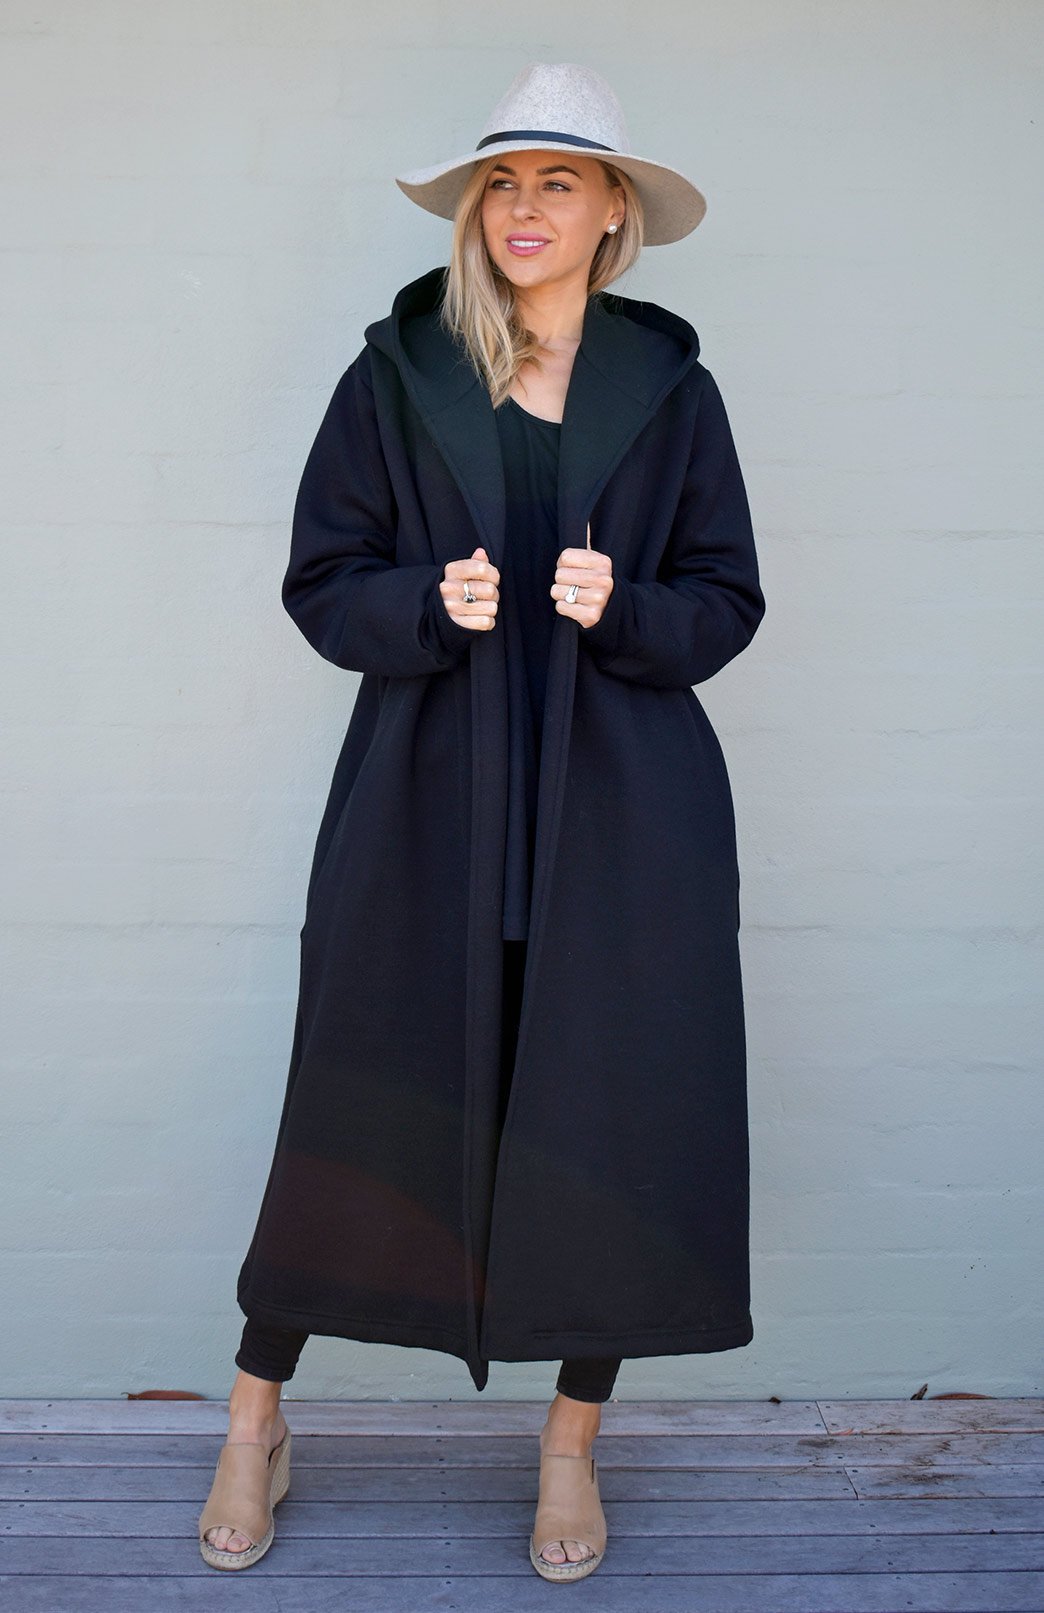 Potter Coat - Women's - Women's Black Pure Merino Wool Winter Coat with Side Pockets, Fleece Lining and Hood - Smitten Merino Tasmania Australia